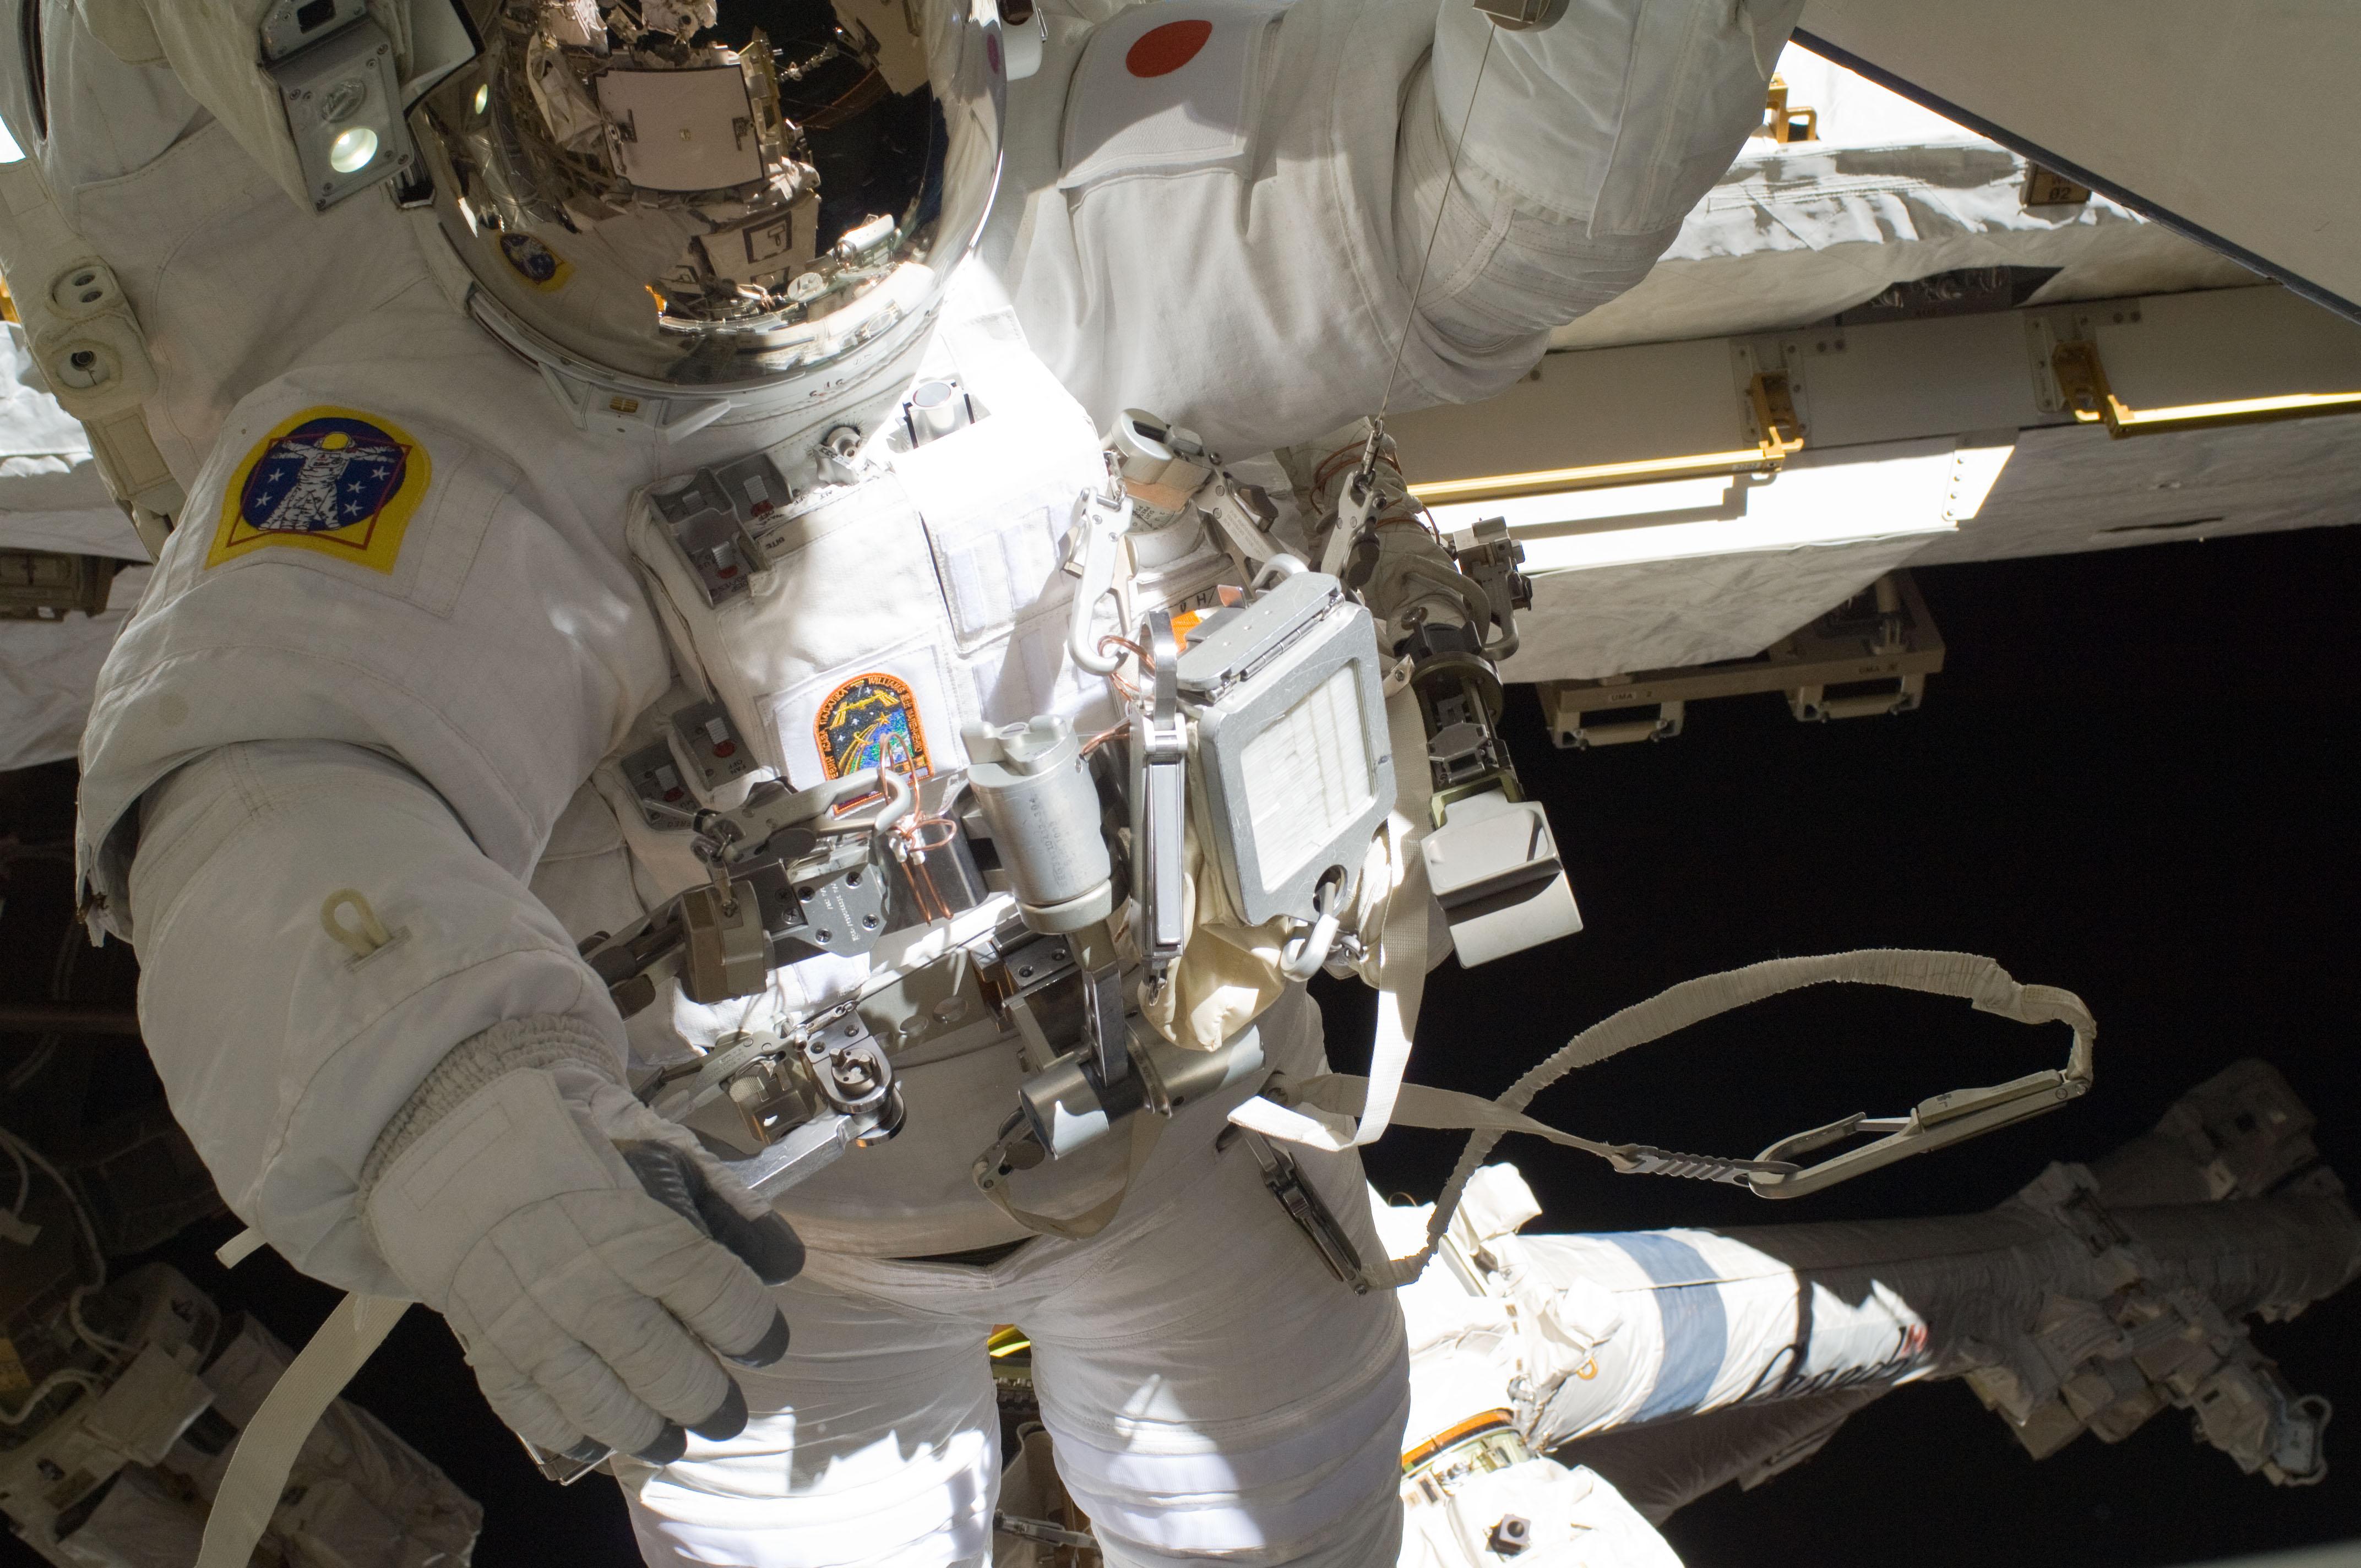 Astronaut Akihiko Hoshide Completes Spacewalk